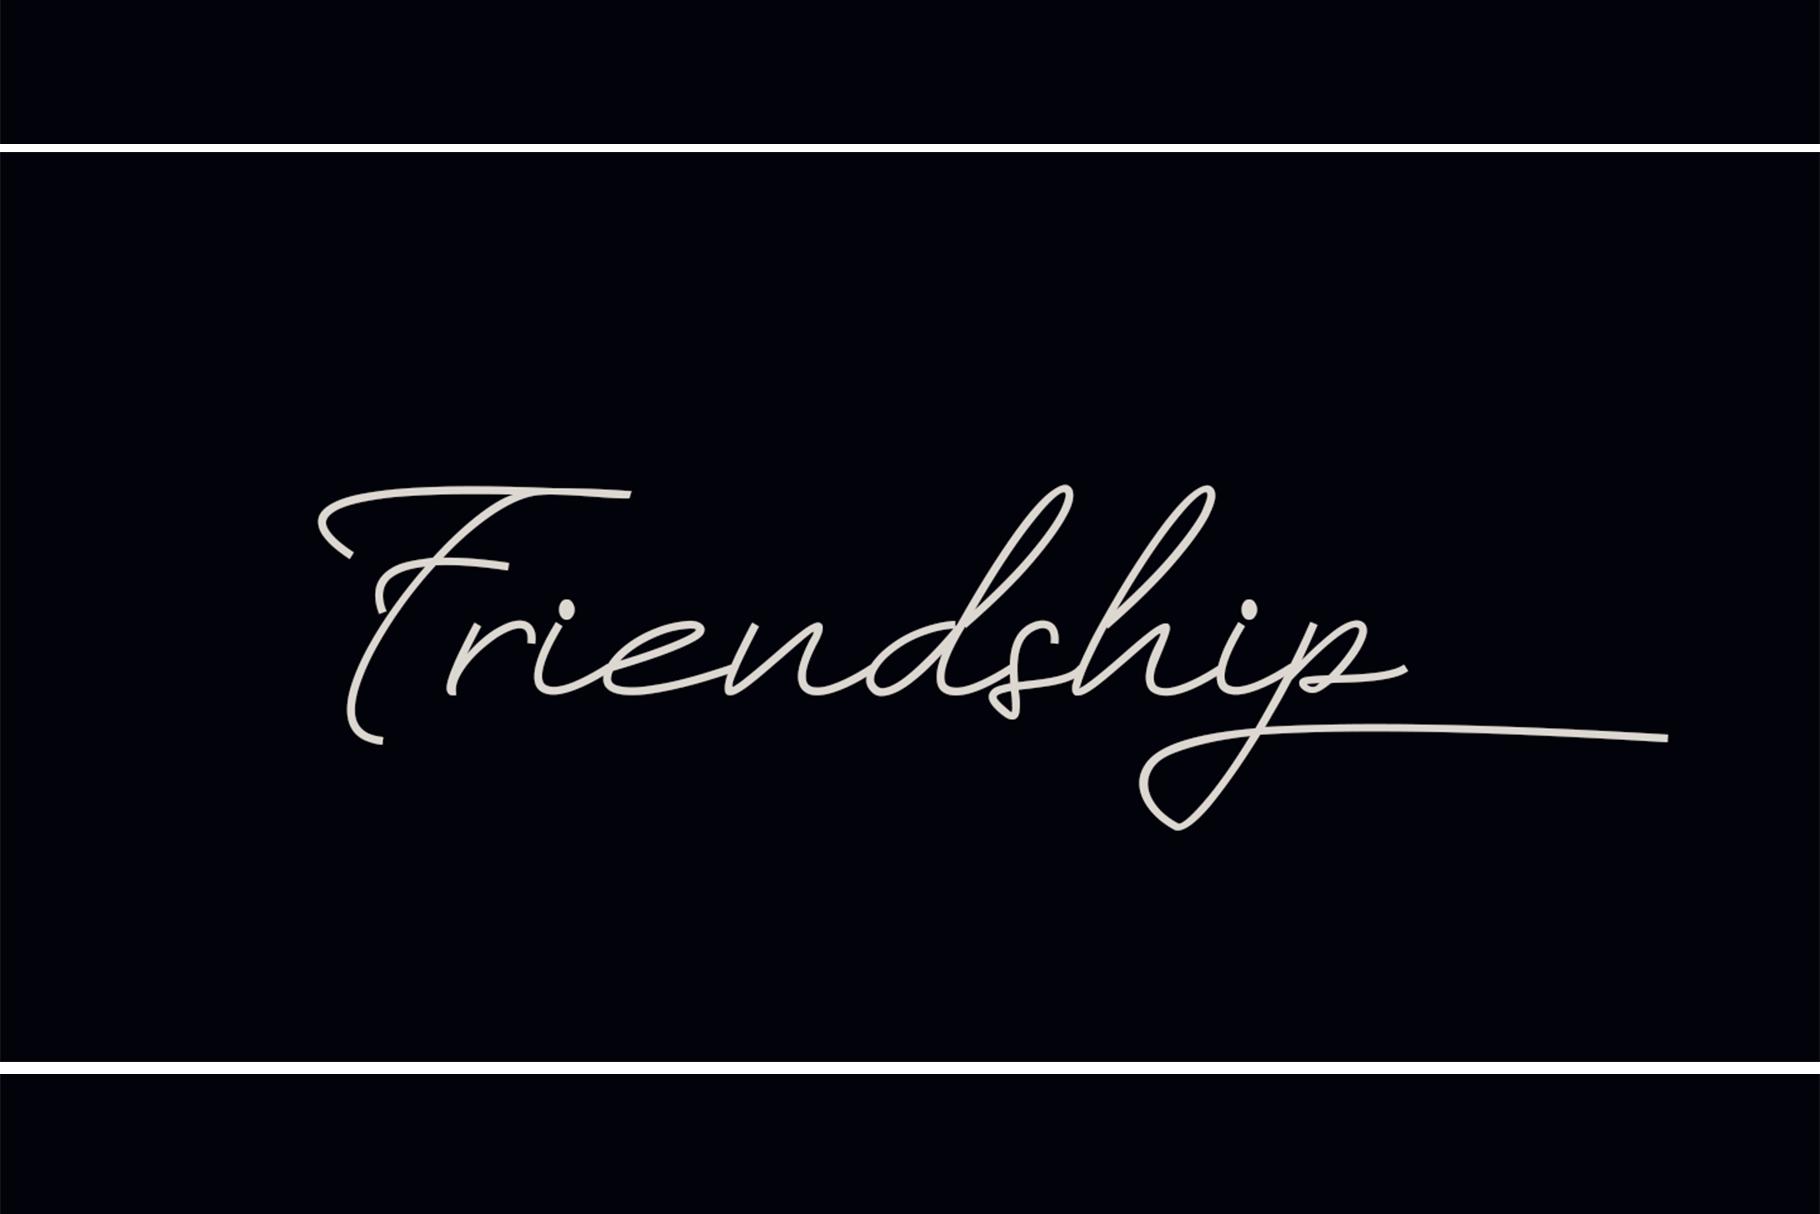 Friendship example image 1